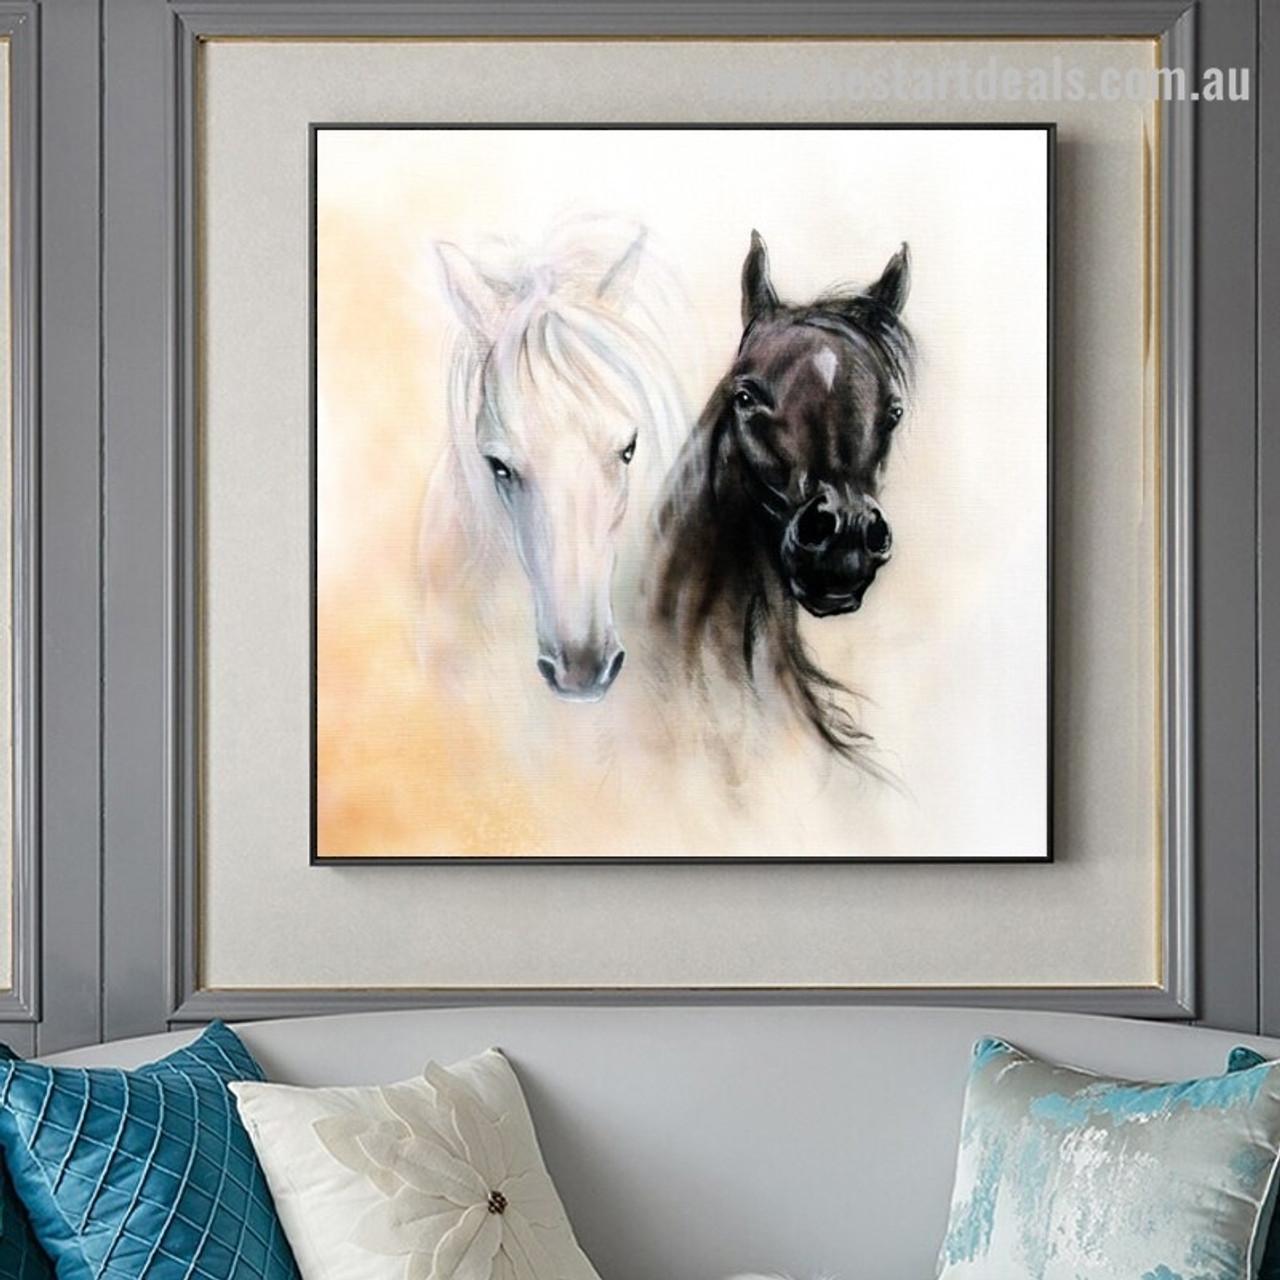 Buy Black White Horse Canvas Print Wall Art Decor